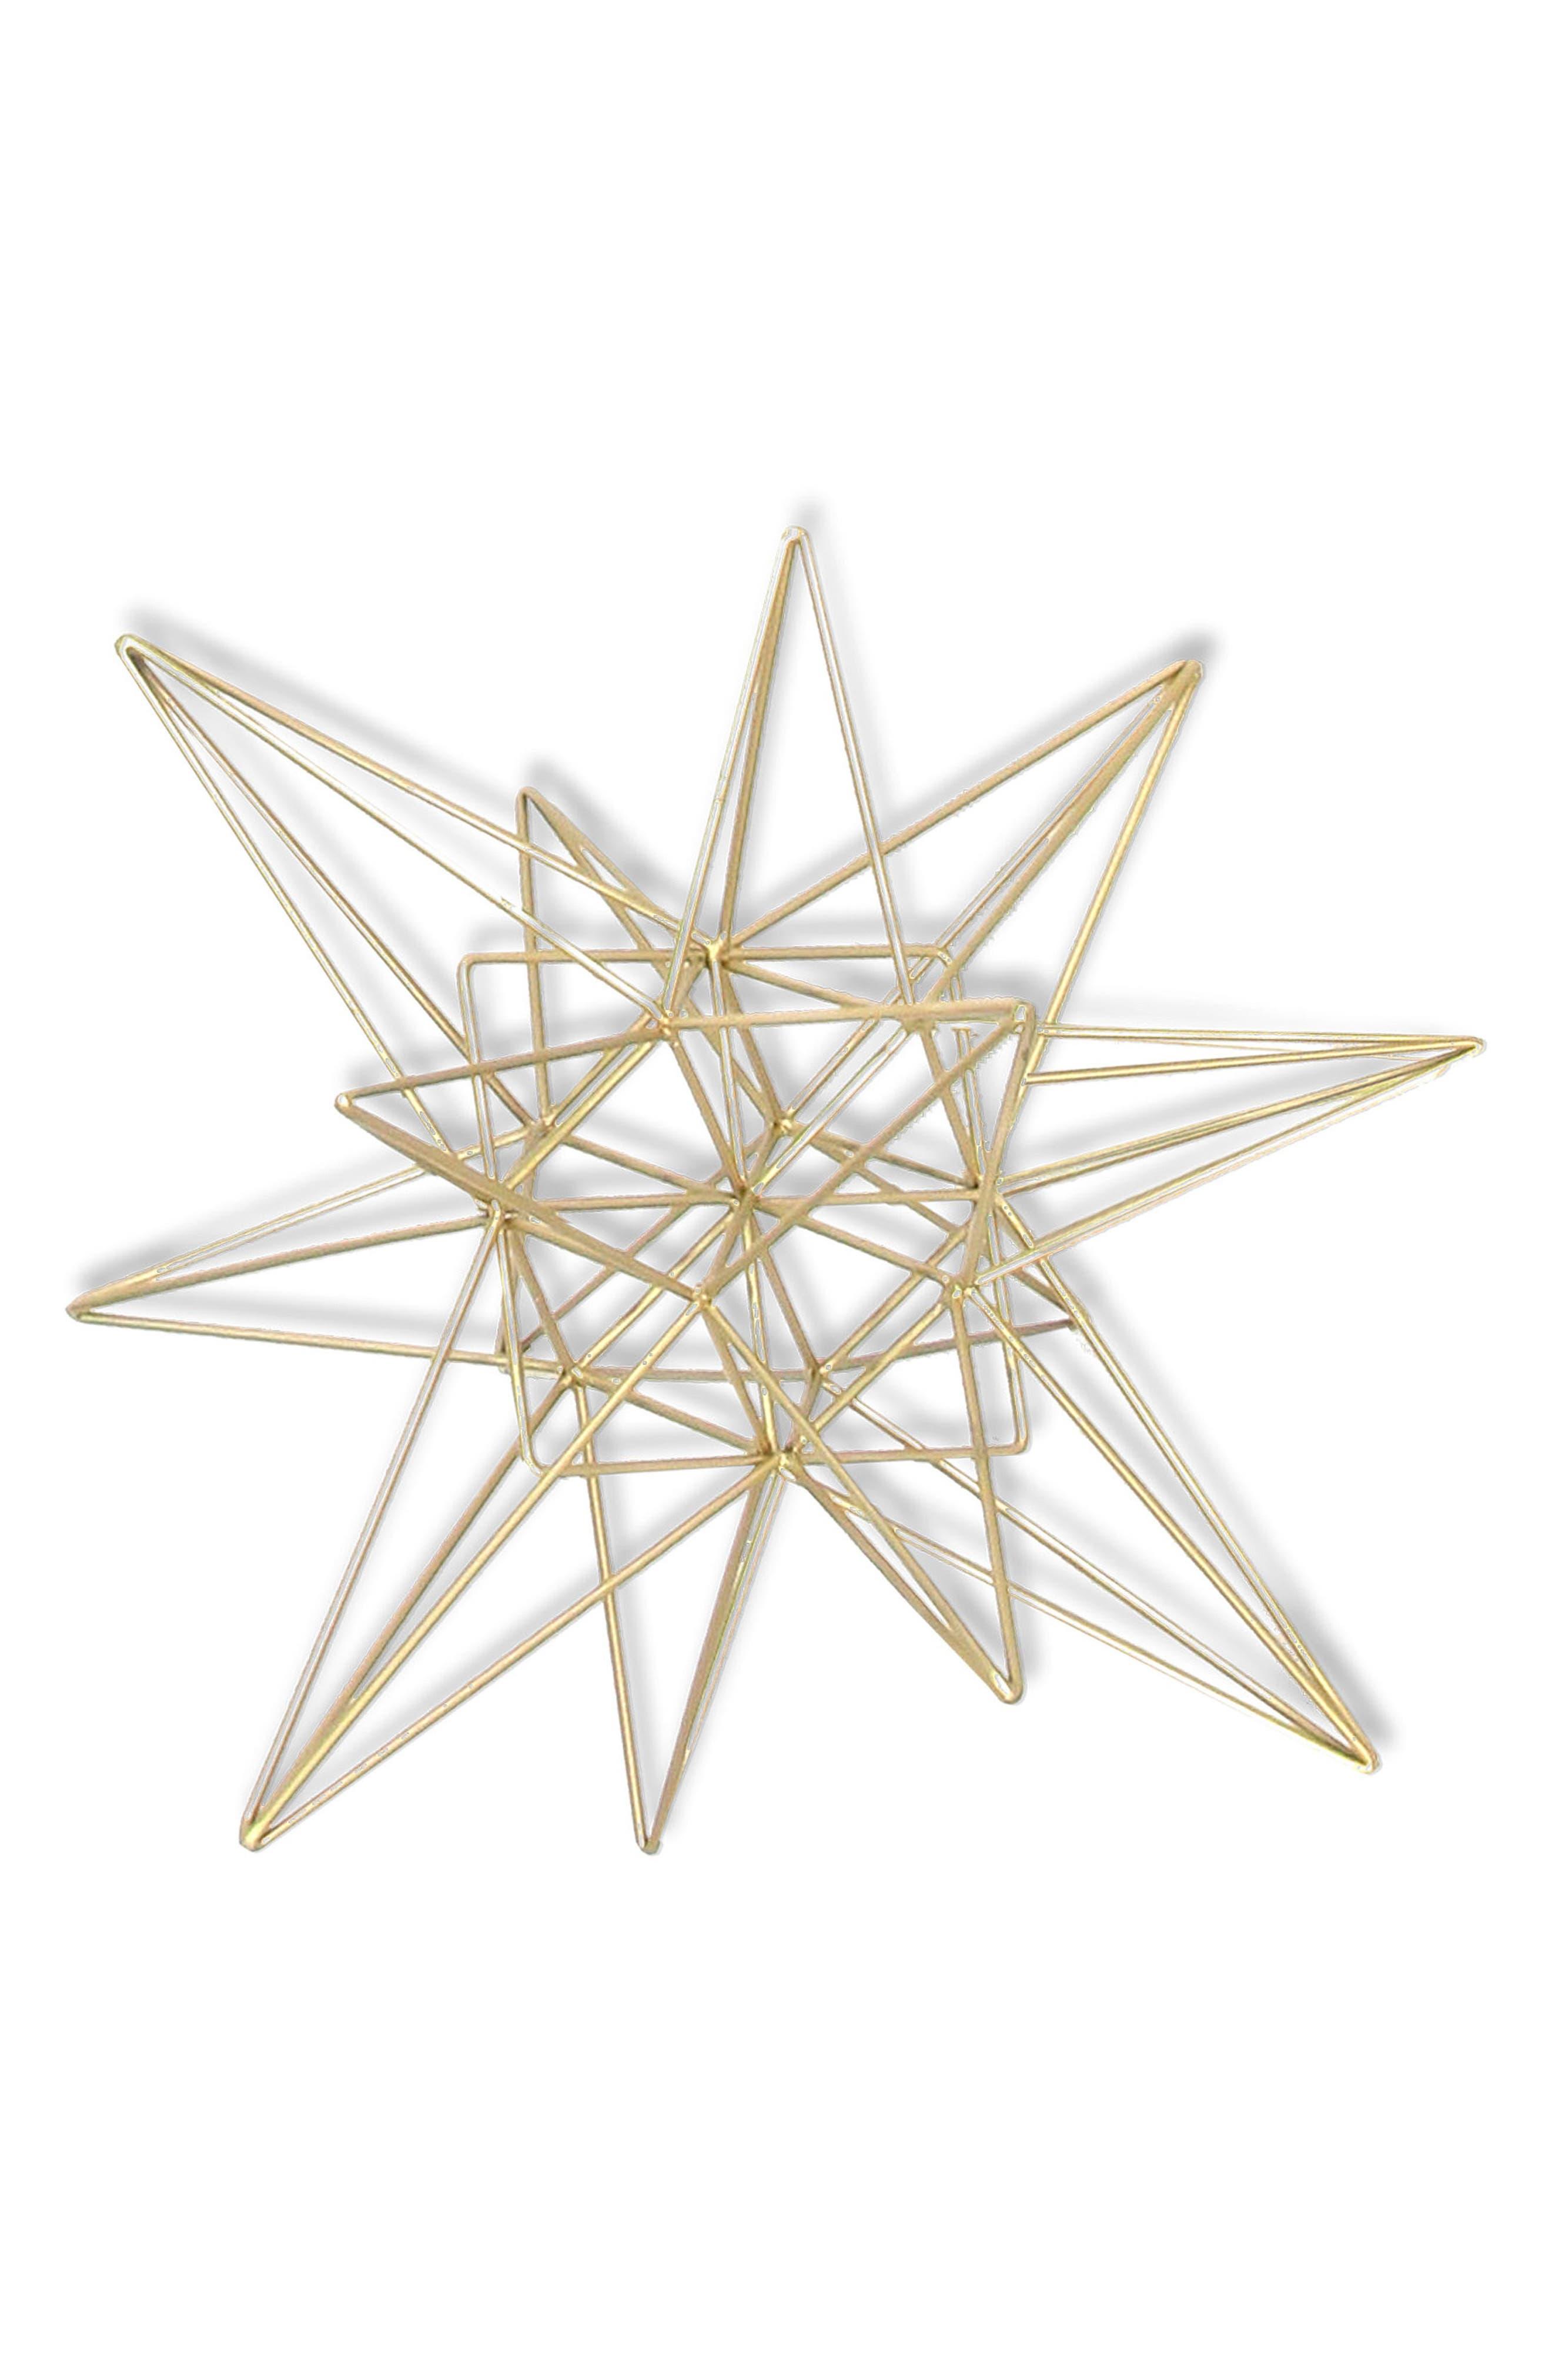 3D Star Goldtone Tabletop Decoration,                         Main,                         color, 710